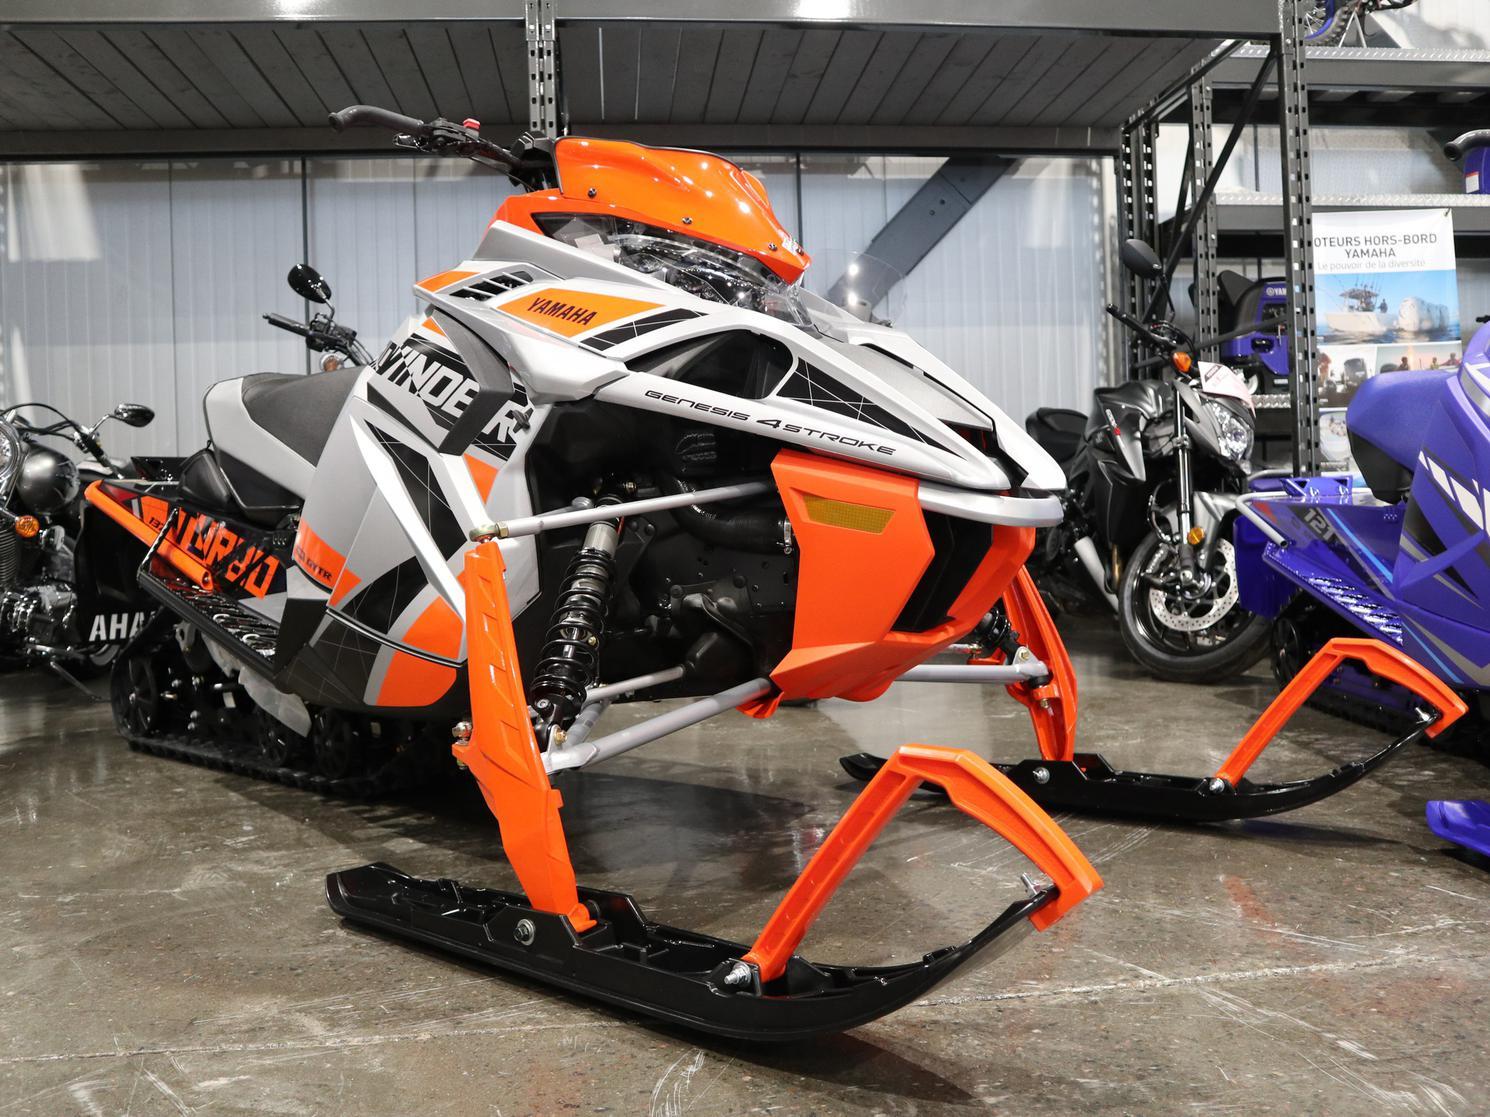 2021 Yamaha SIDEWINDER L-TX SE GARANTIE 3 ANS